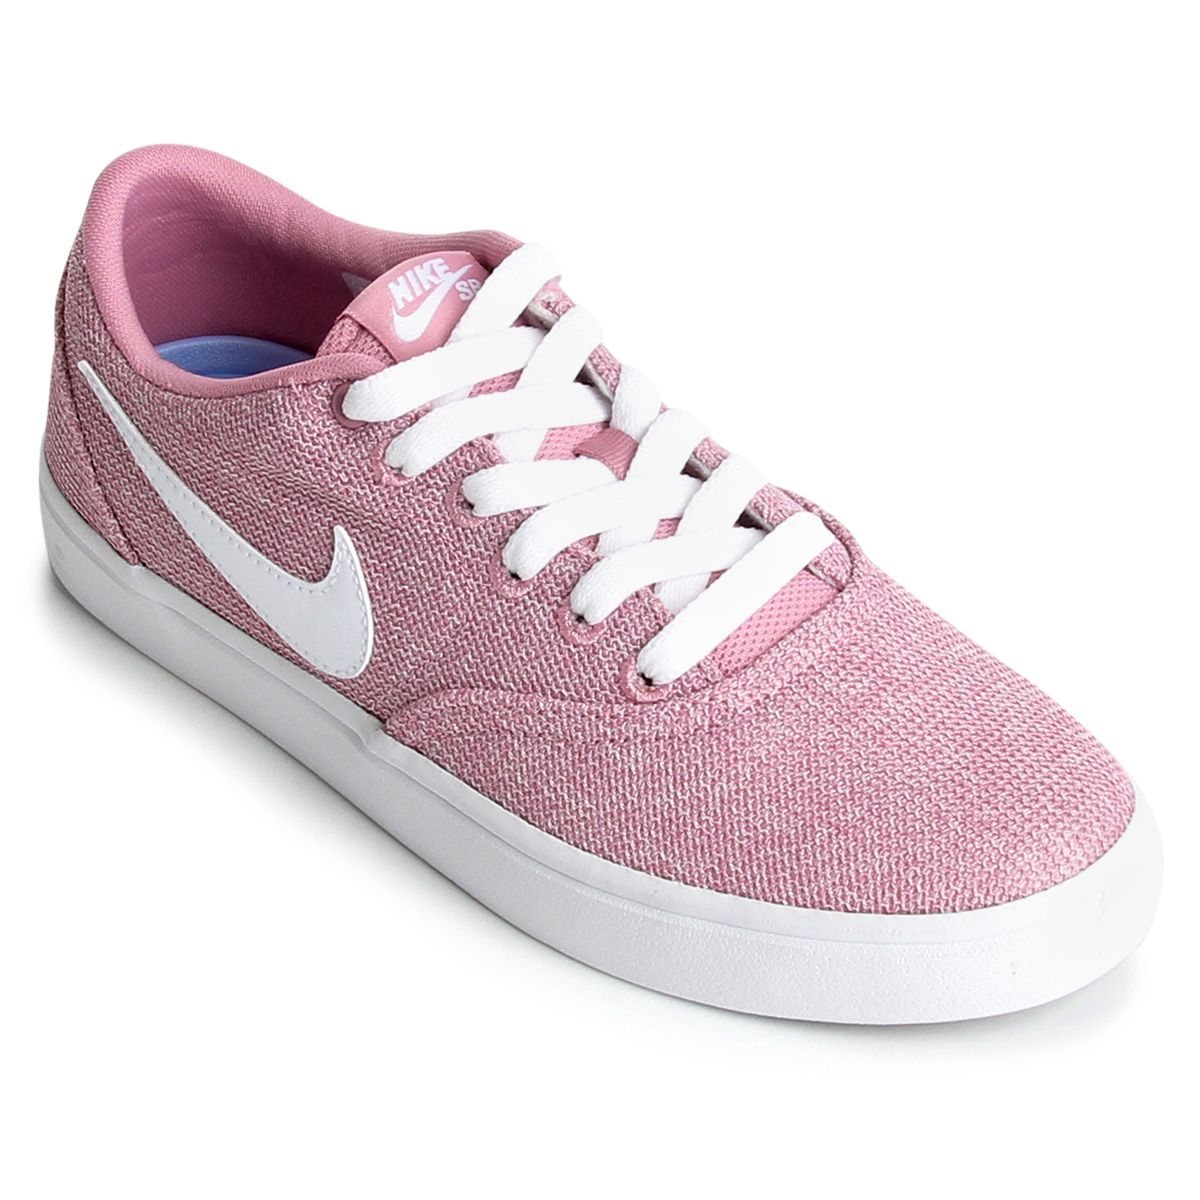 df0990b34a1 Tênis Nike Wmns Sb Check Solar Cvs P Feminino - Preto e Rosa ...